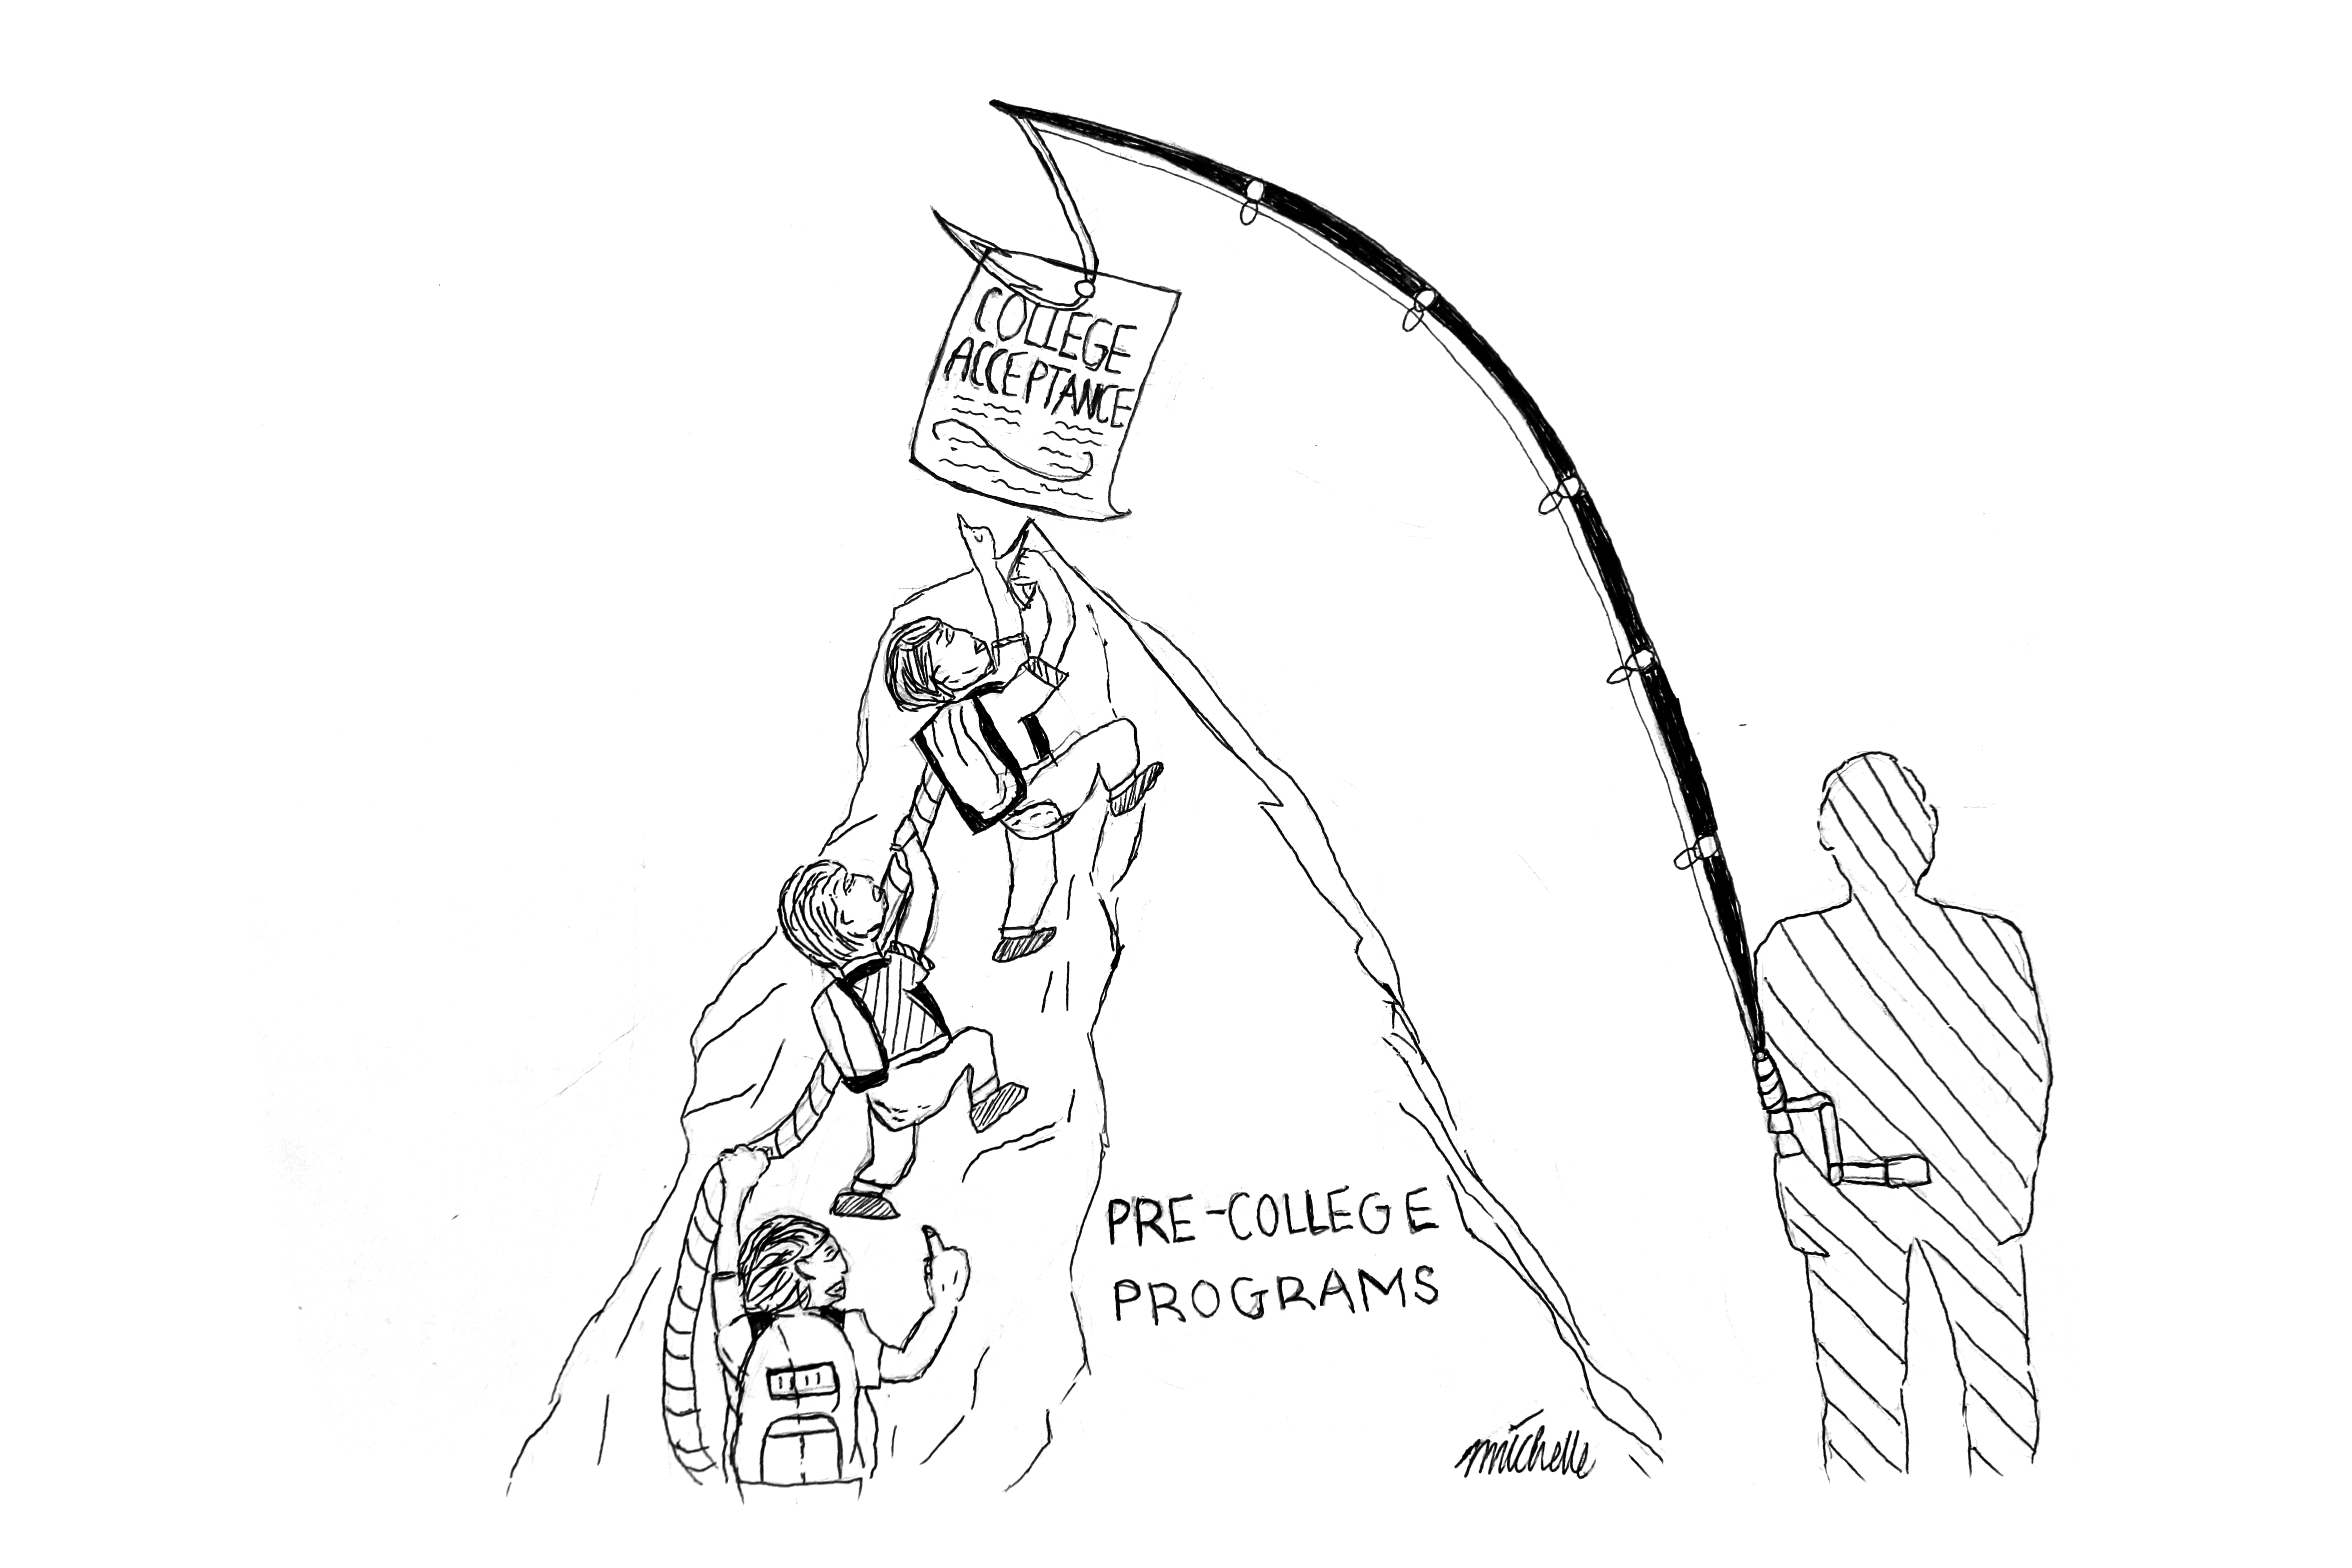 Pre-college+programs+make+no+guarantees